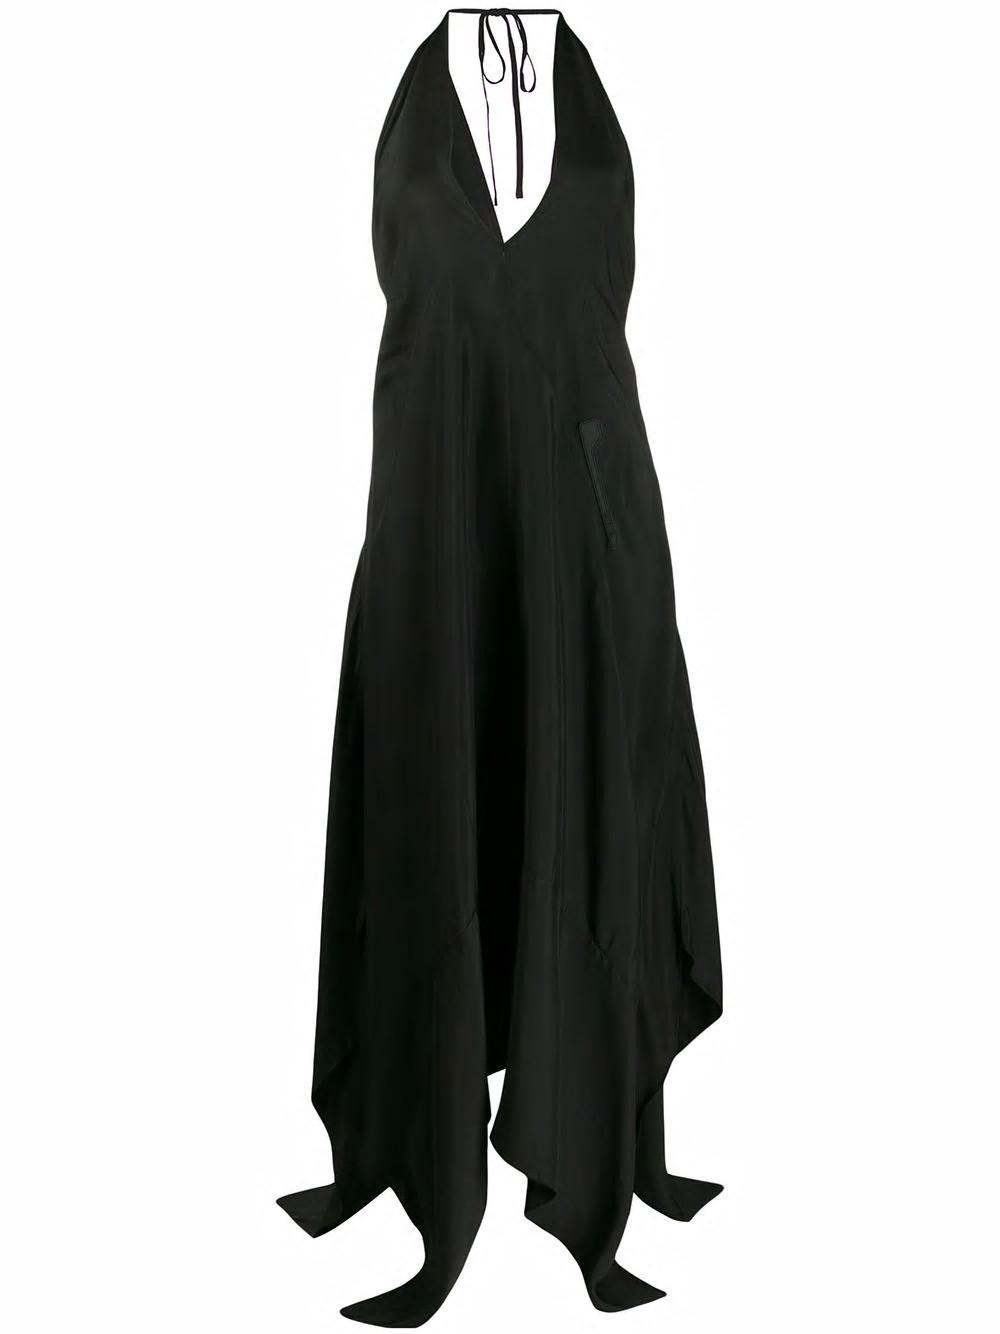 VULCANO DRESS